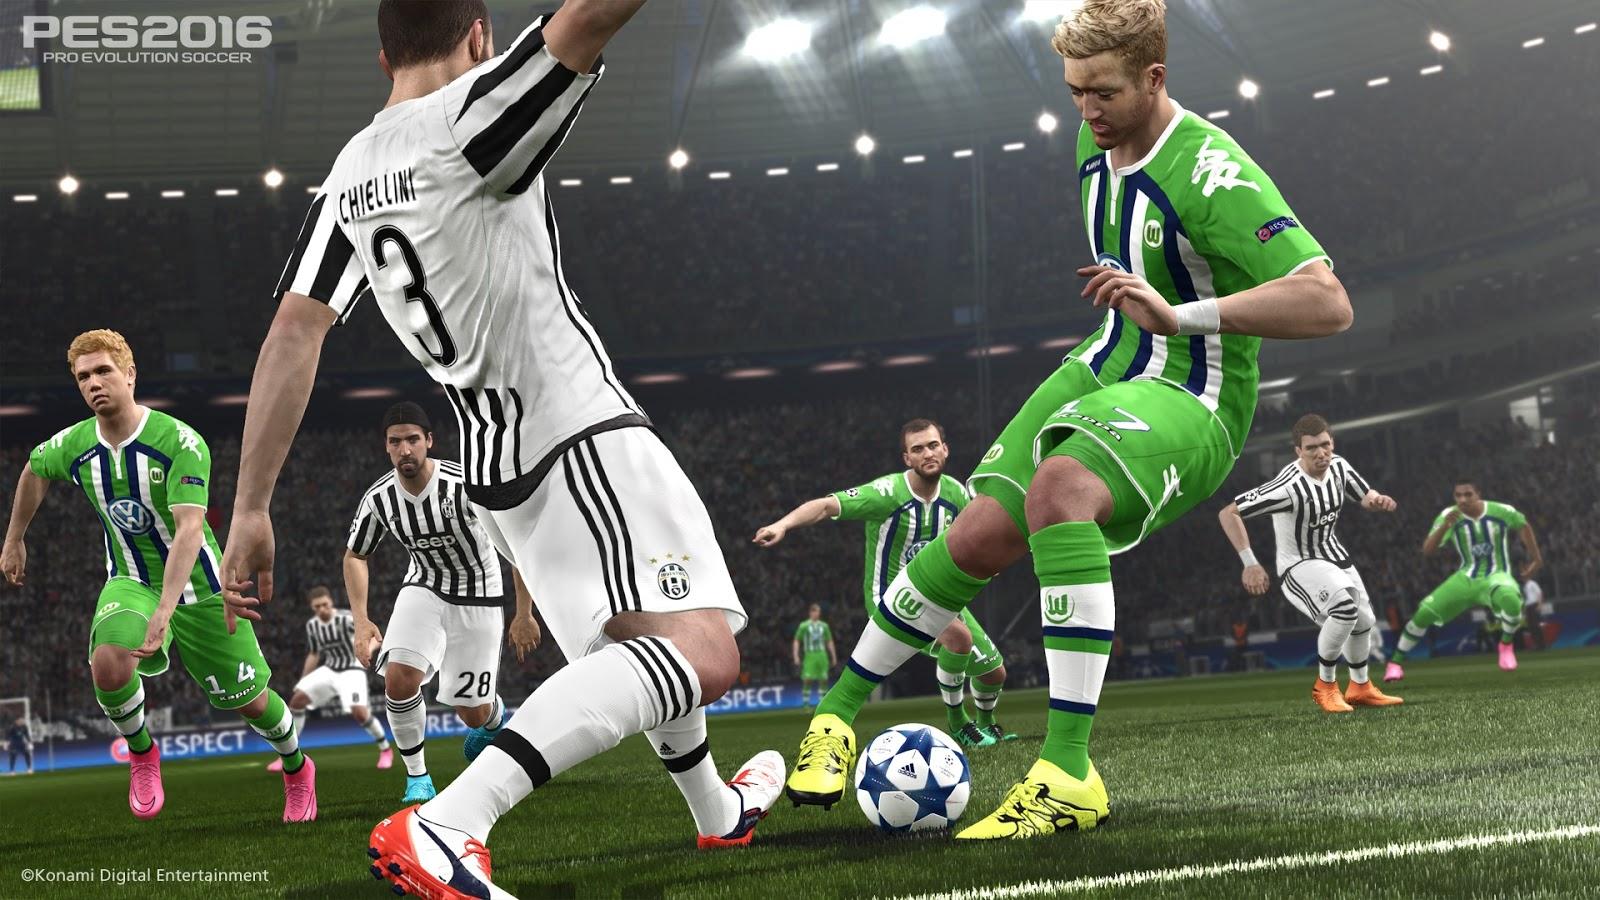 pro evolution soccer 2016 pc gratuit complet startimes